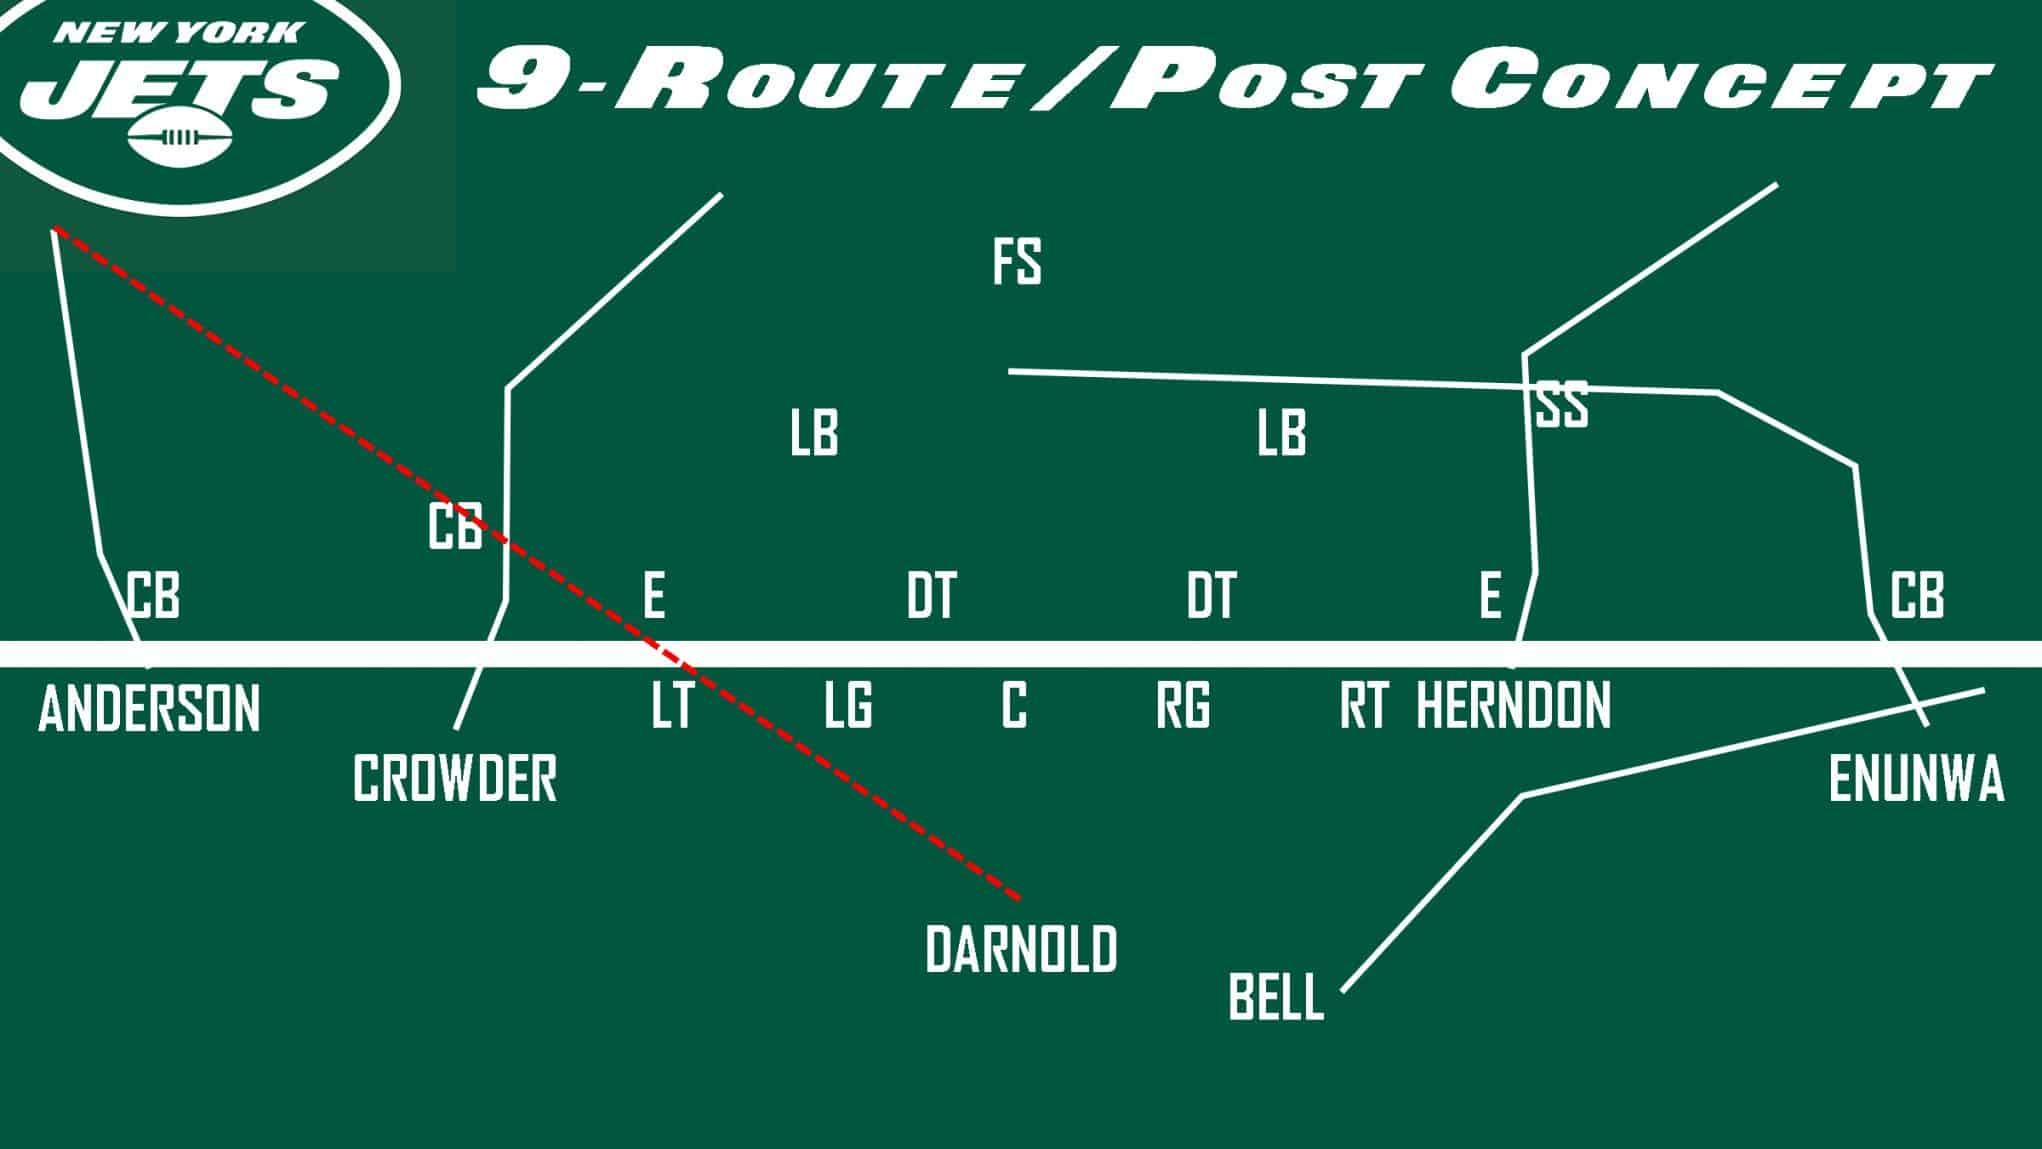 Jets 9-Route Post Concept